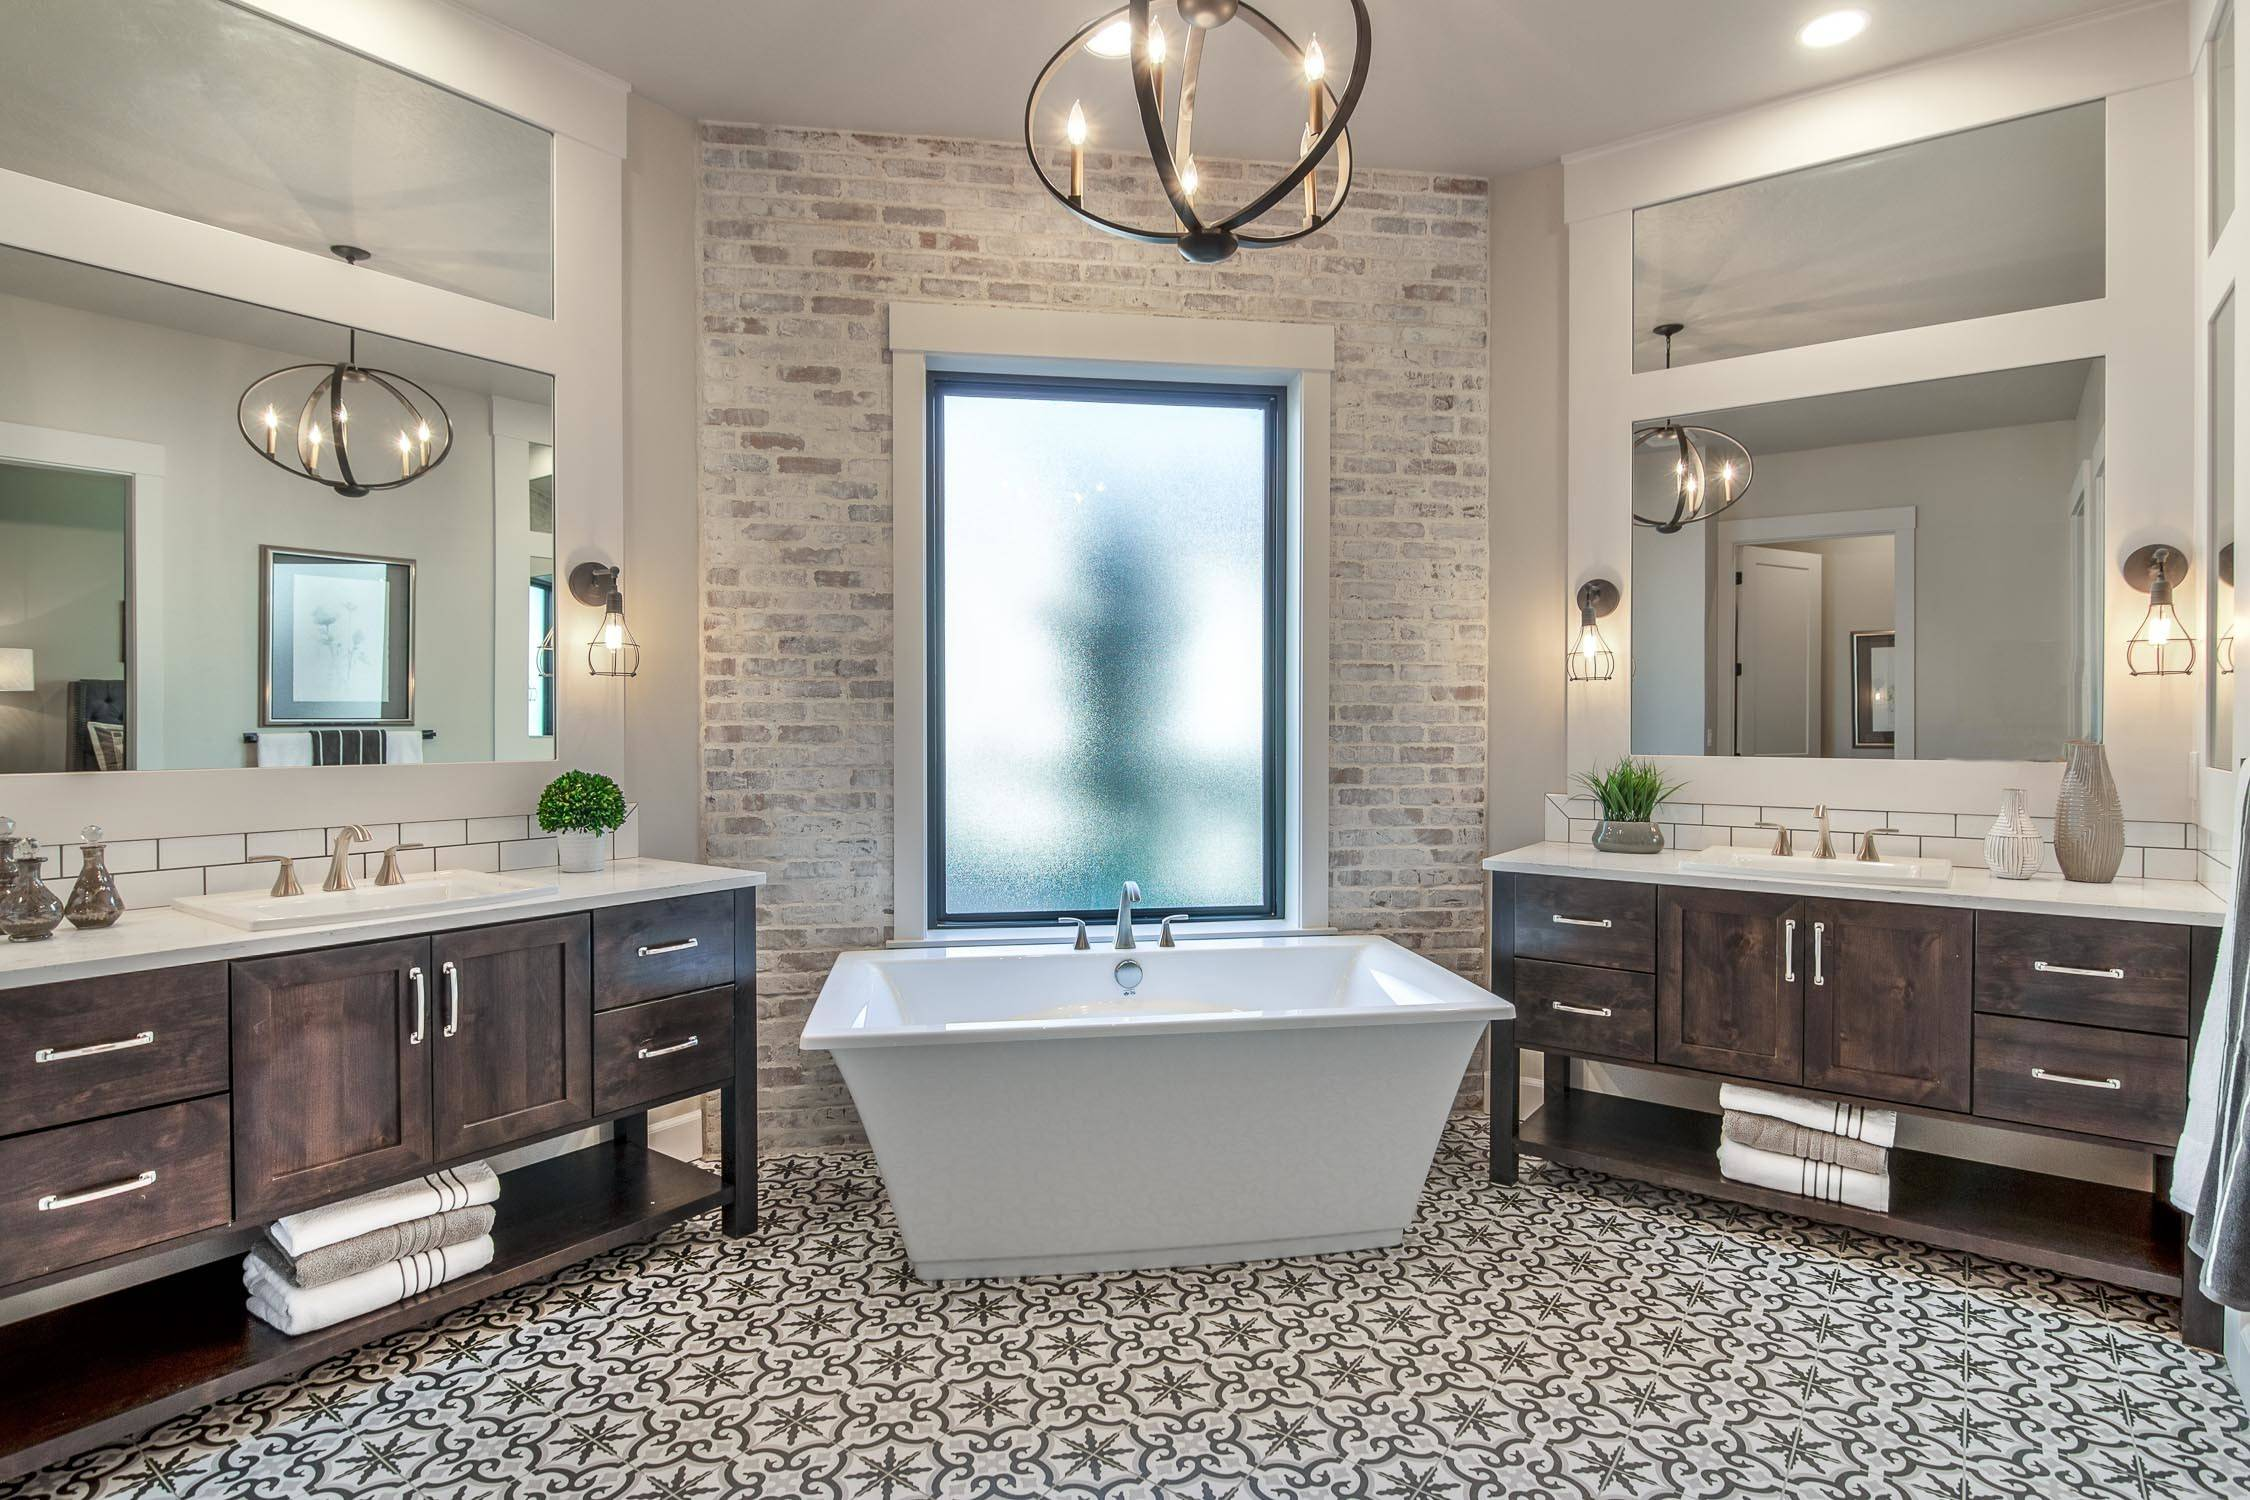 Our Bathroom Design Gallery